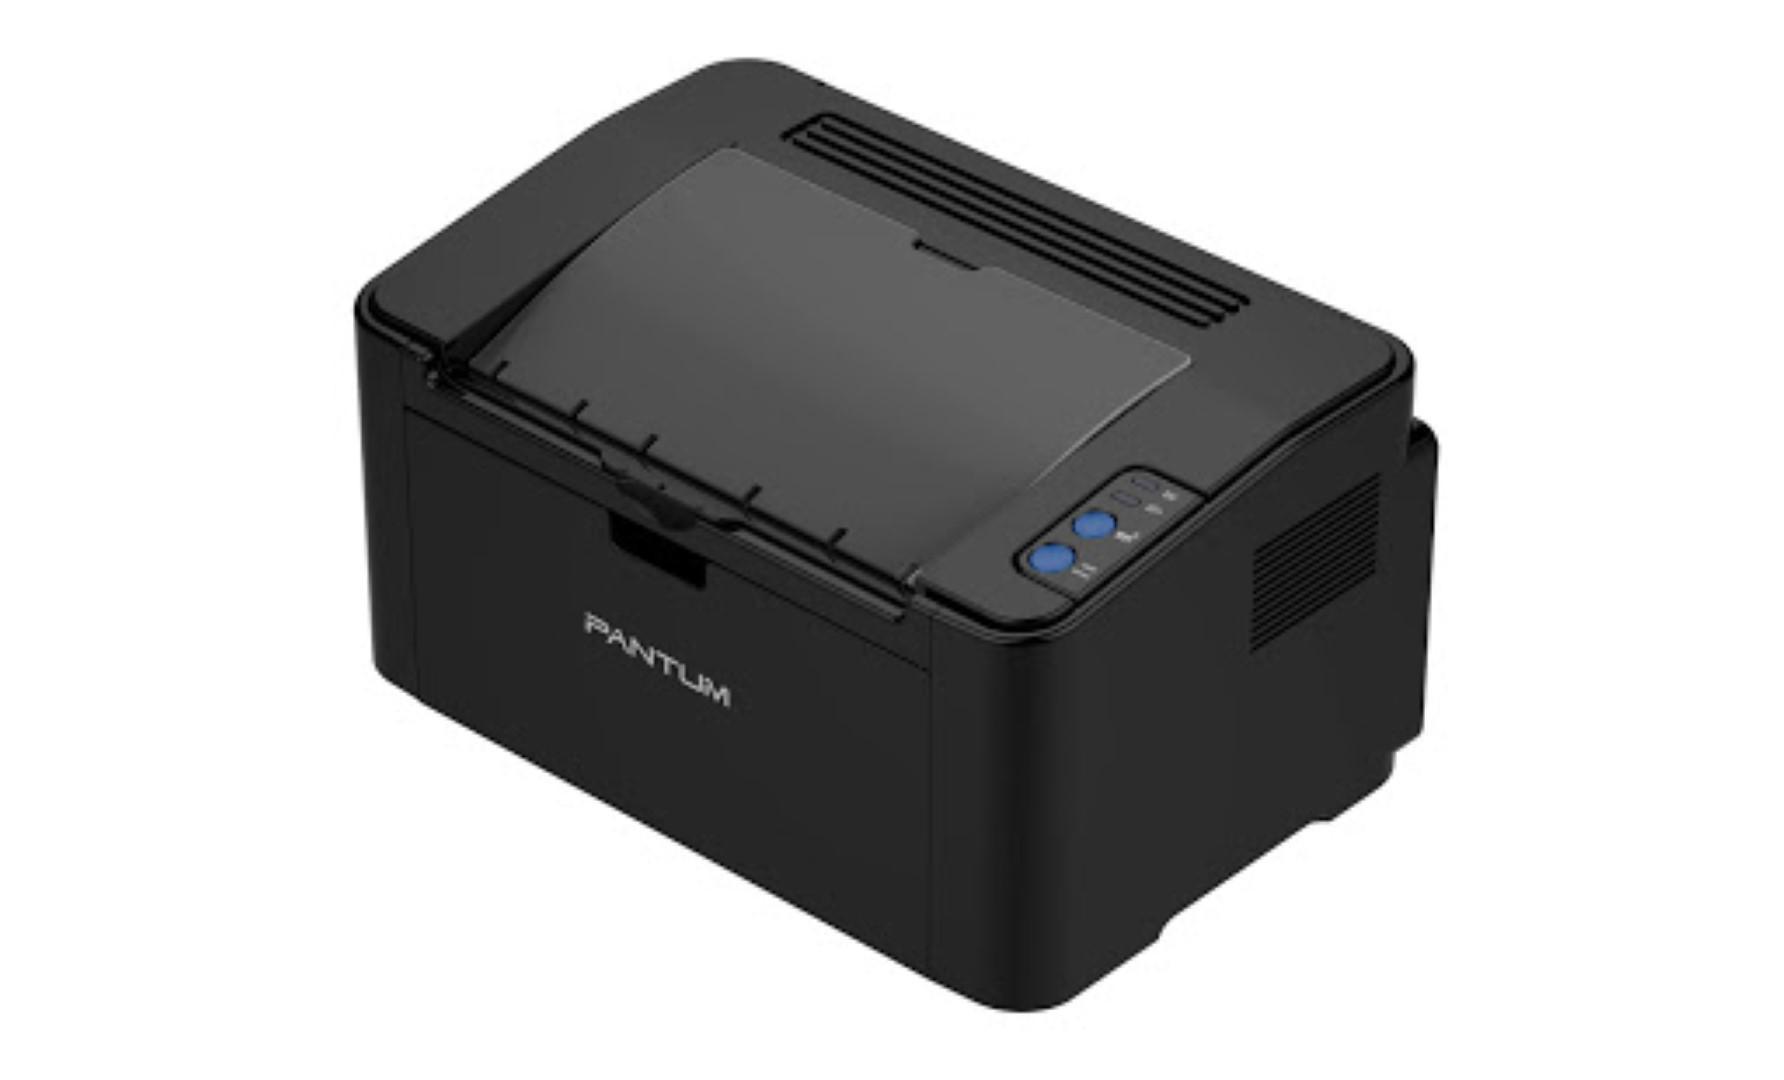 Imprimanta laser mono Pantum P2500W, Dimensiune:A4, Rezolutie:max 1200x1200, Viteza:22ppm, Procesor:600 MHz, Memorie:128MB, Capacitate alimentare 150 de coli, capacitate iesire:100 coli, Greutate hartie: 60- 163 g/mpLimbaj de printare : GDI, Volum recomandat 700 pagini, volum maxim 15000 pagini - imaginea 1